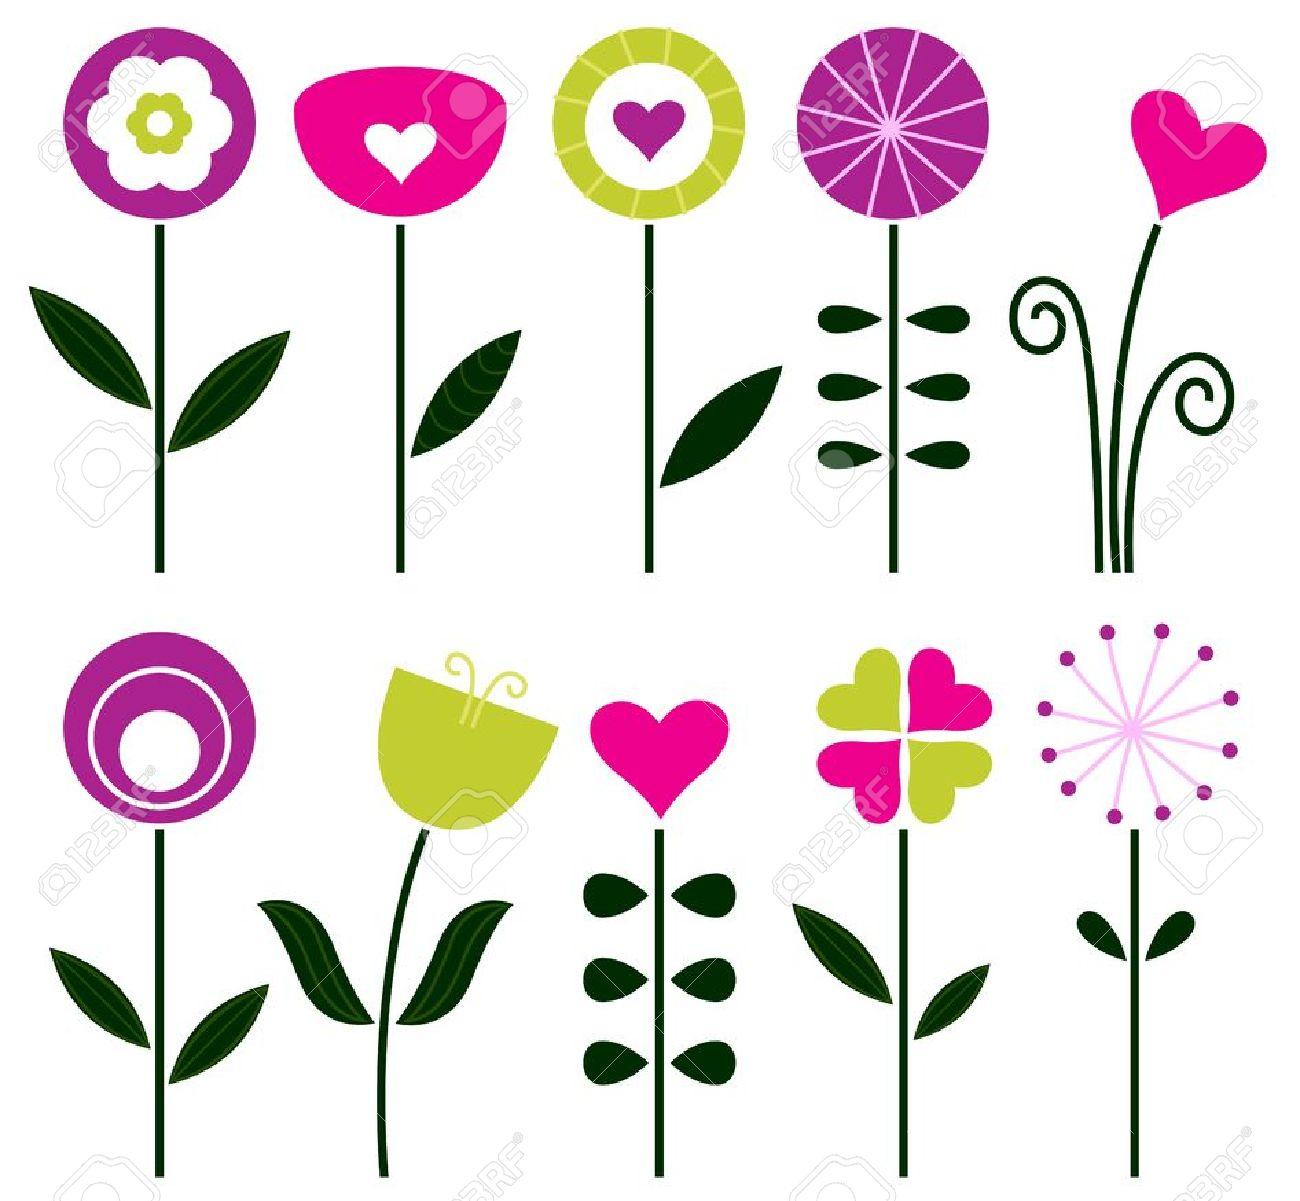 Retro Flowers Set Isolated On White. Vector Illustration Royalty.